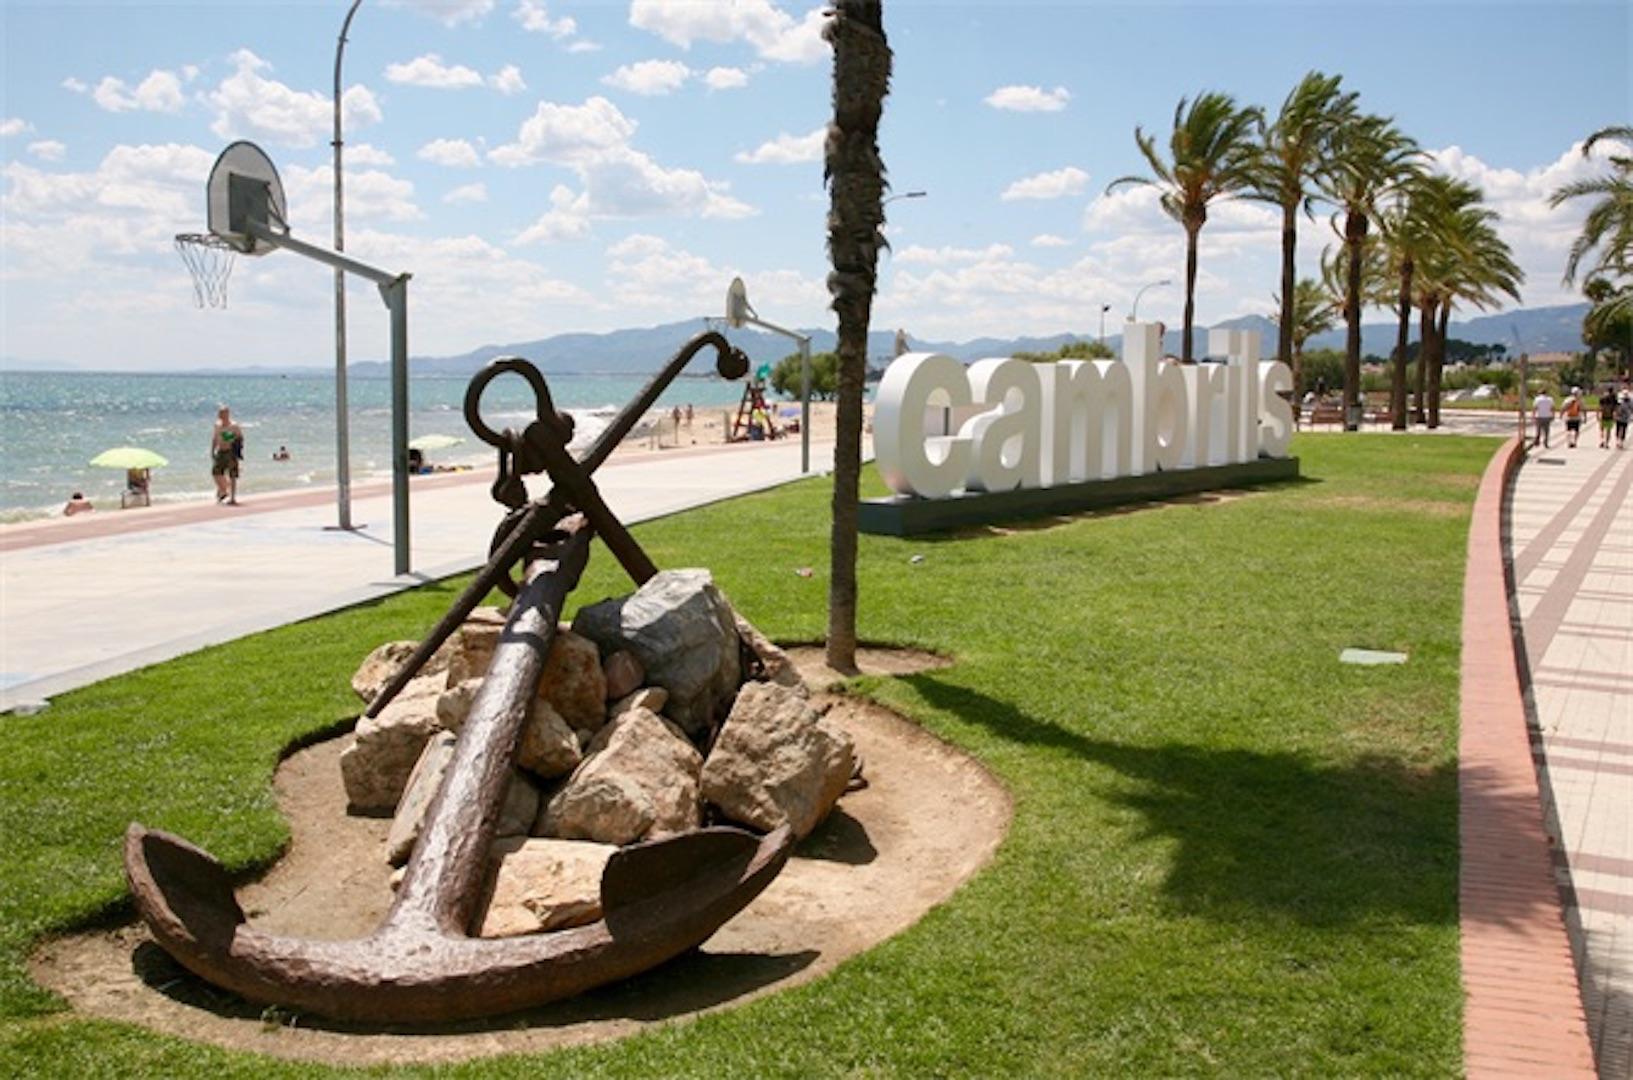 The Costa Daurada experience